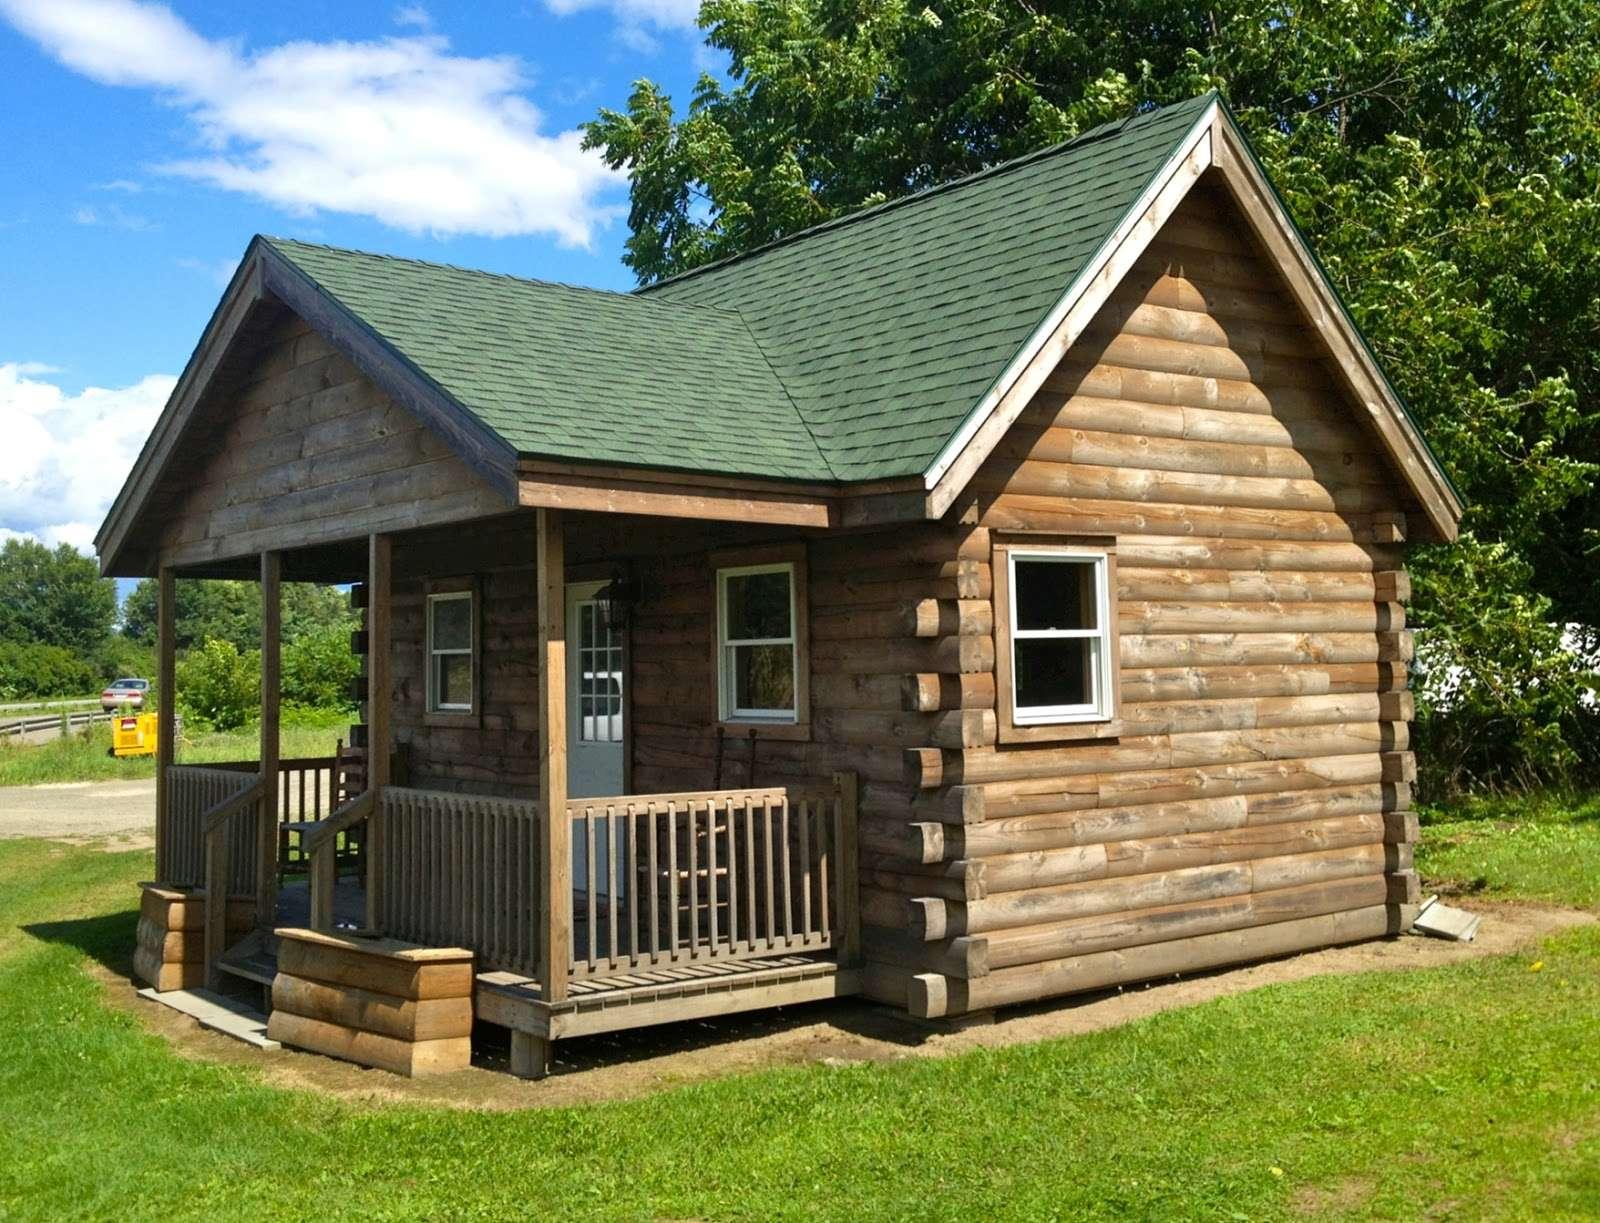 Small Scale Homes Tiny Home Near Binghamton